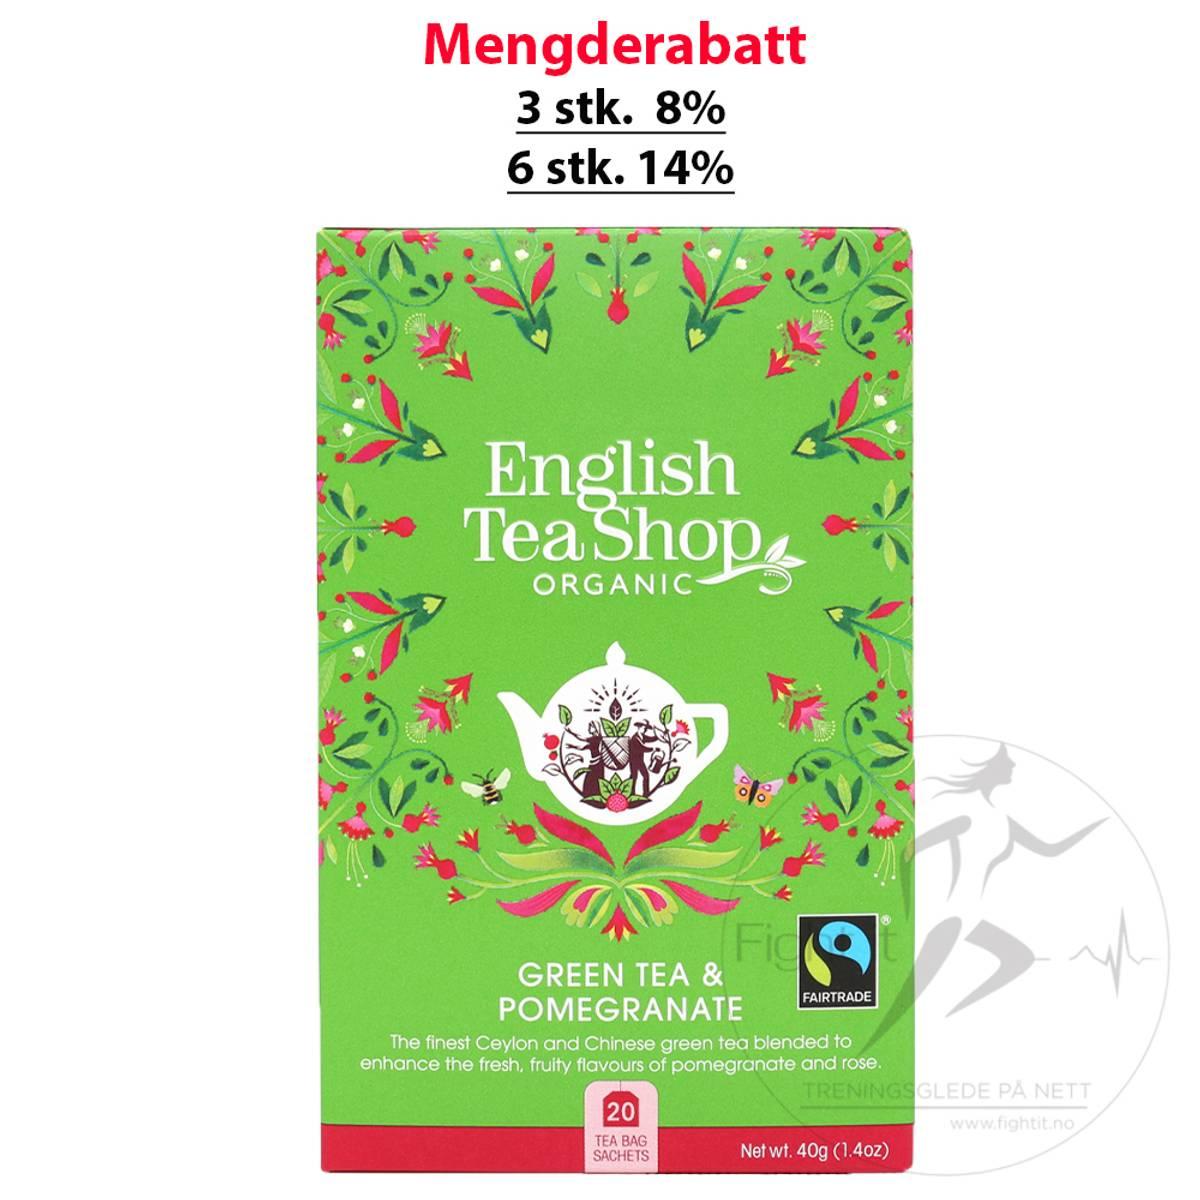 English Tea Shop - Green Tea & Pomegranate